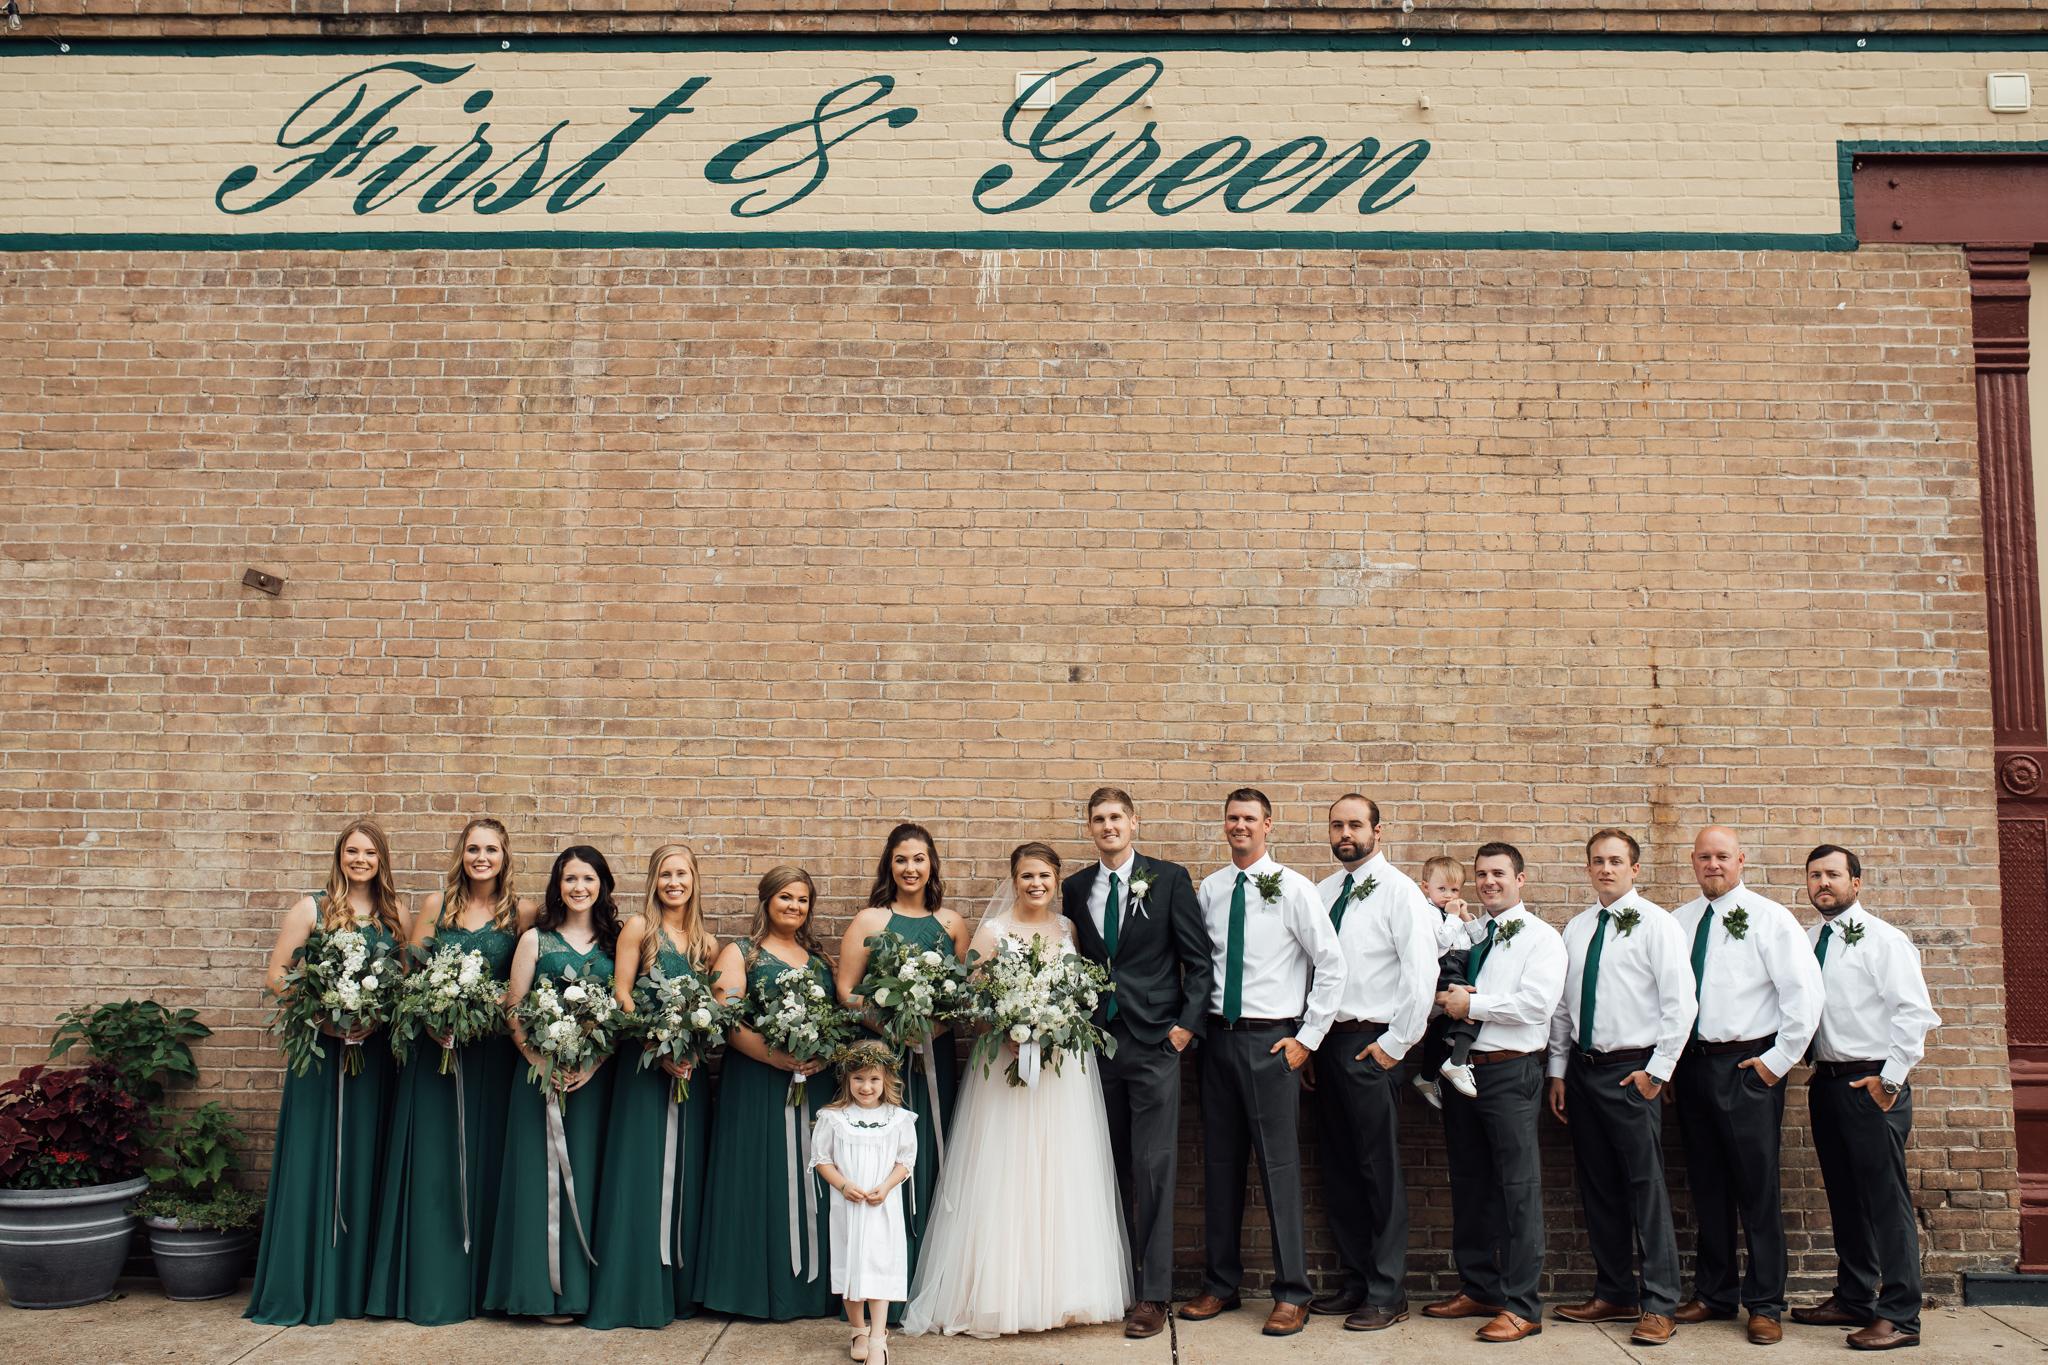 thewarmtharoundyou-grenada-wedding-first-and-green-wedding (113 of 62).jpg